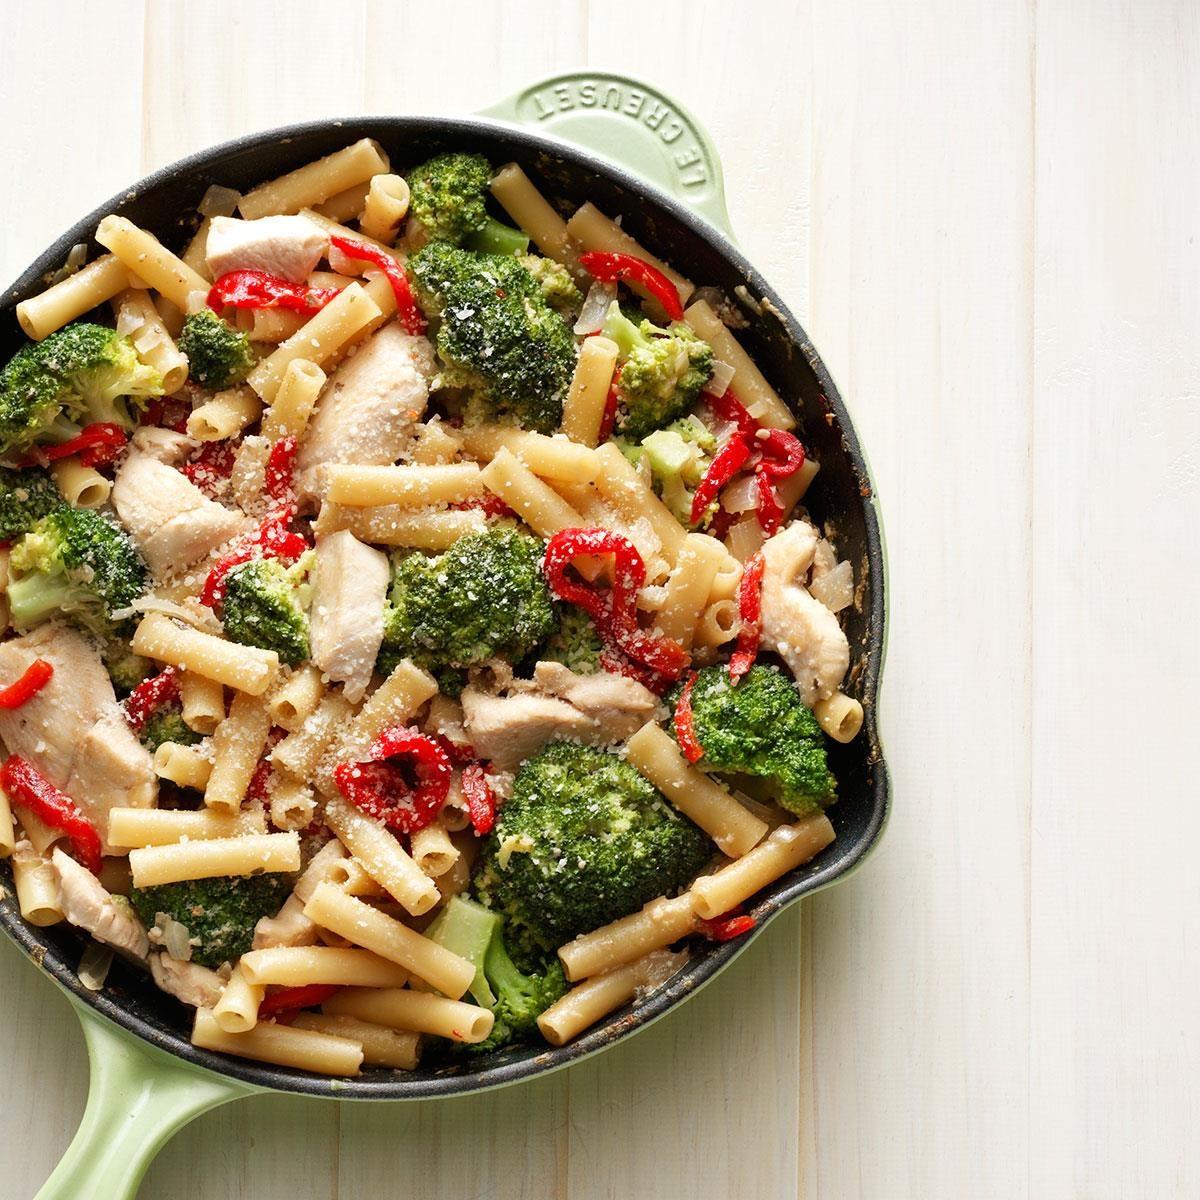 Skillet Ziti With Chicken And Broccoli Recipe